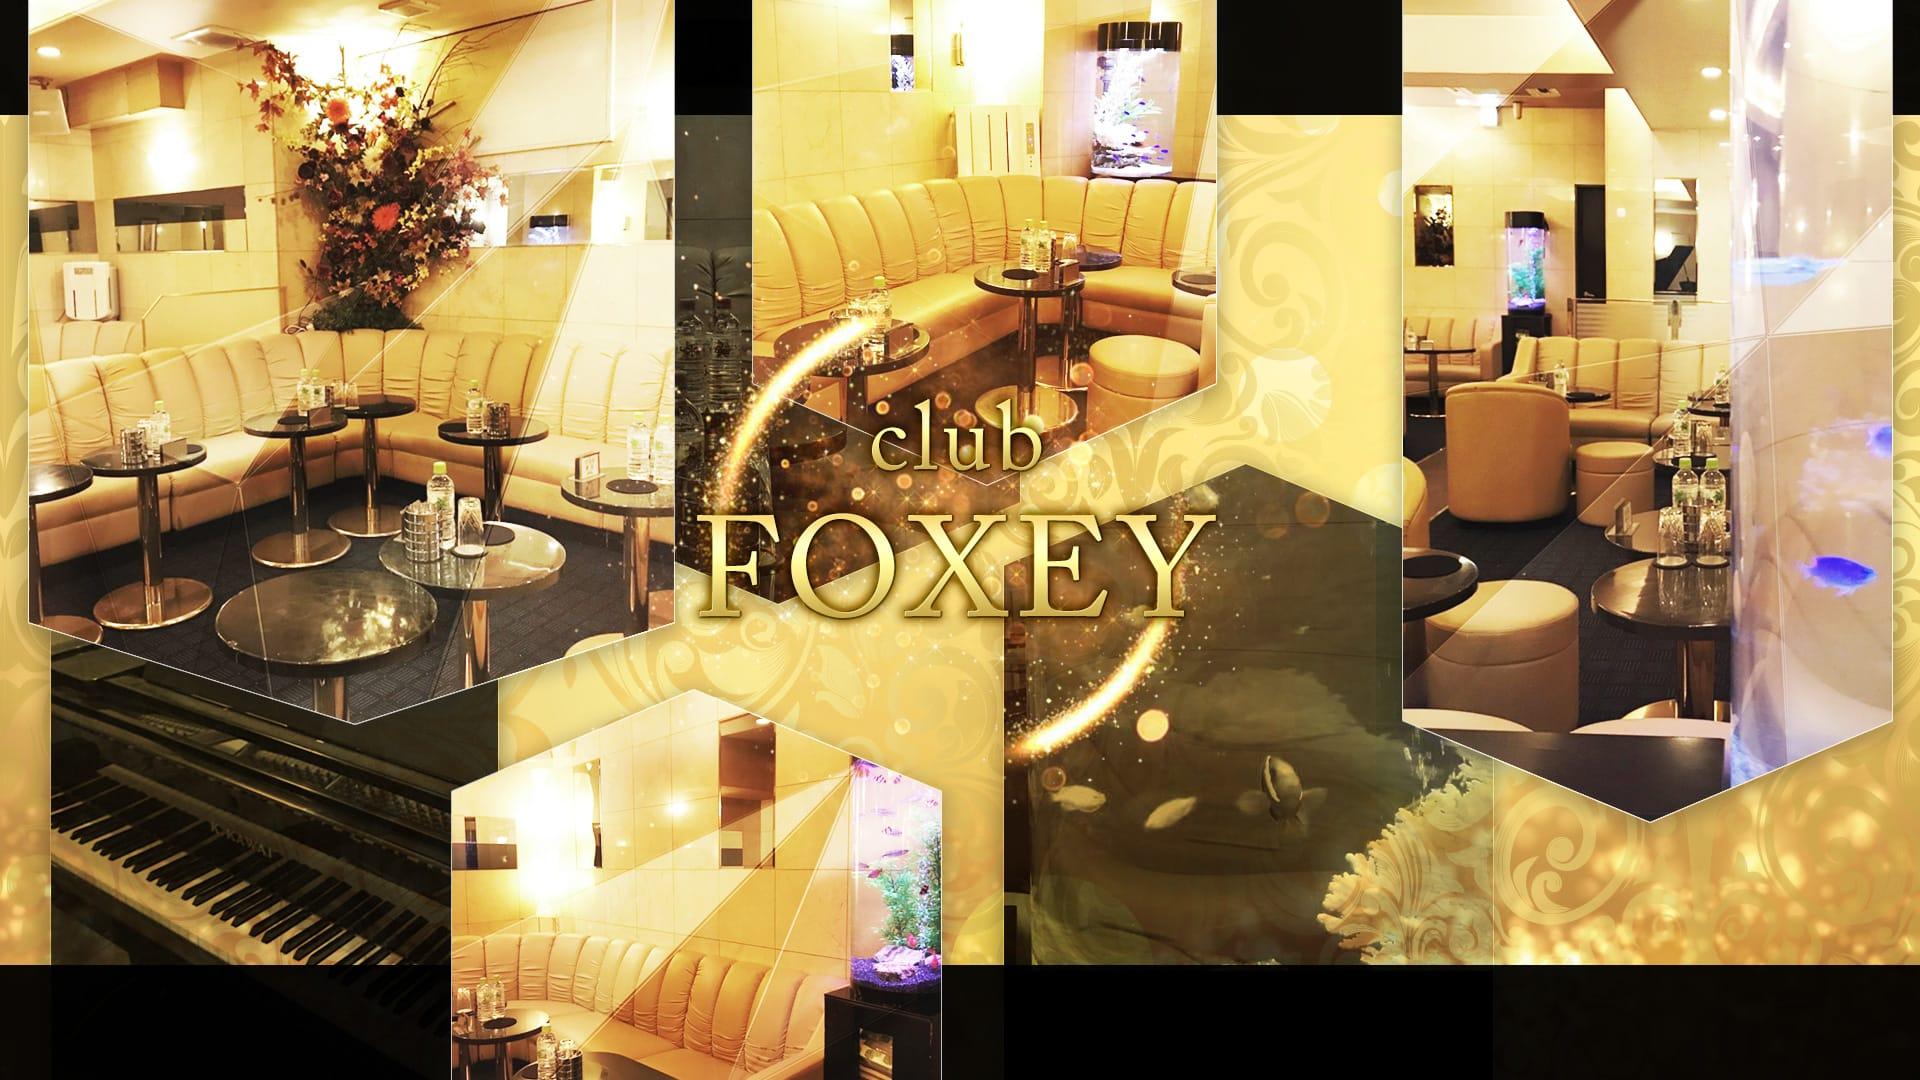 FOXEY[フォクシー] 川崎 キャバクラ TOP画像